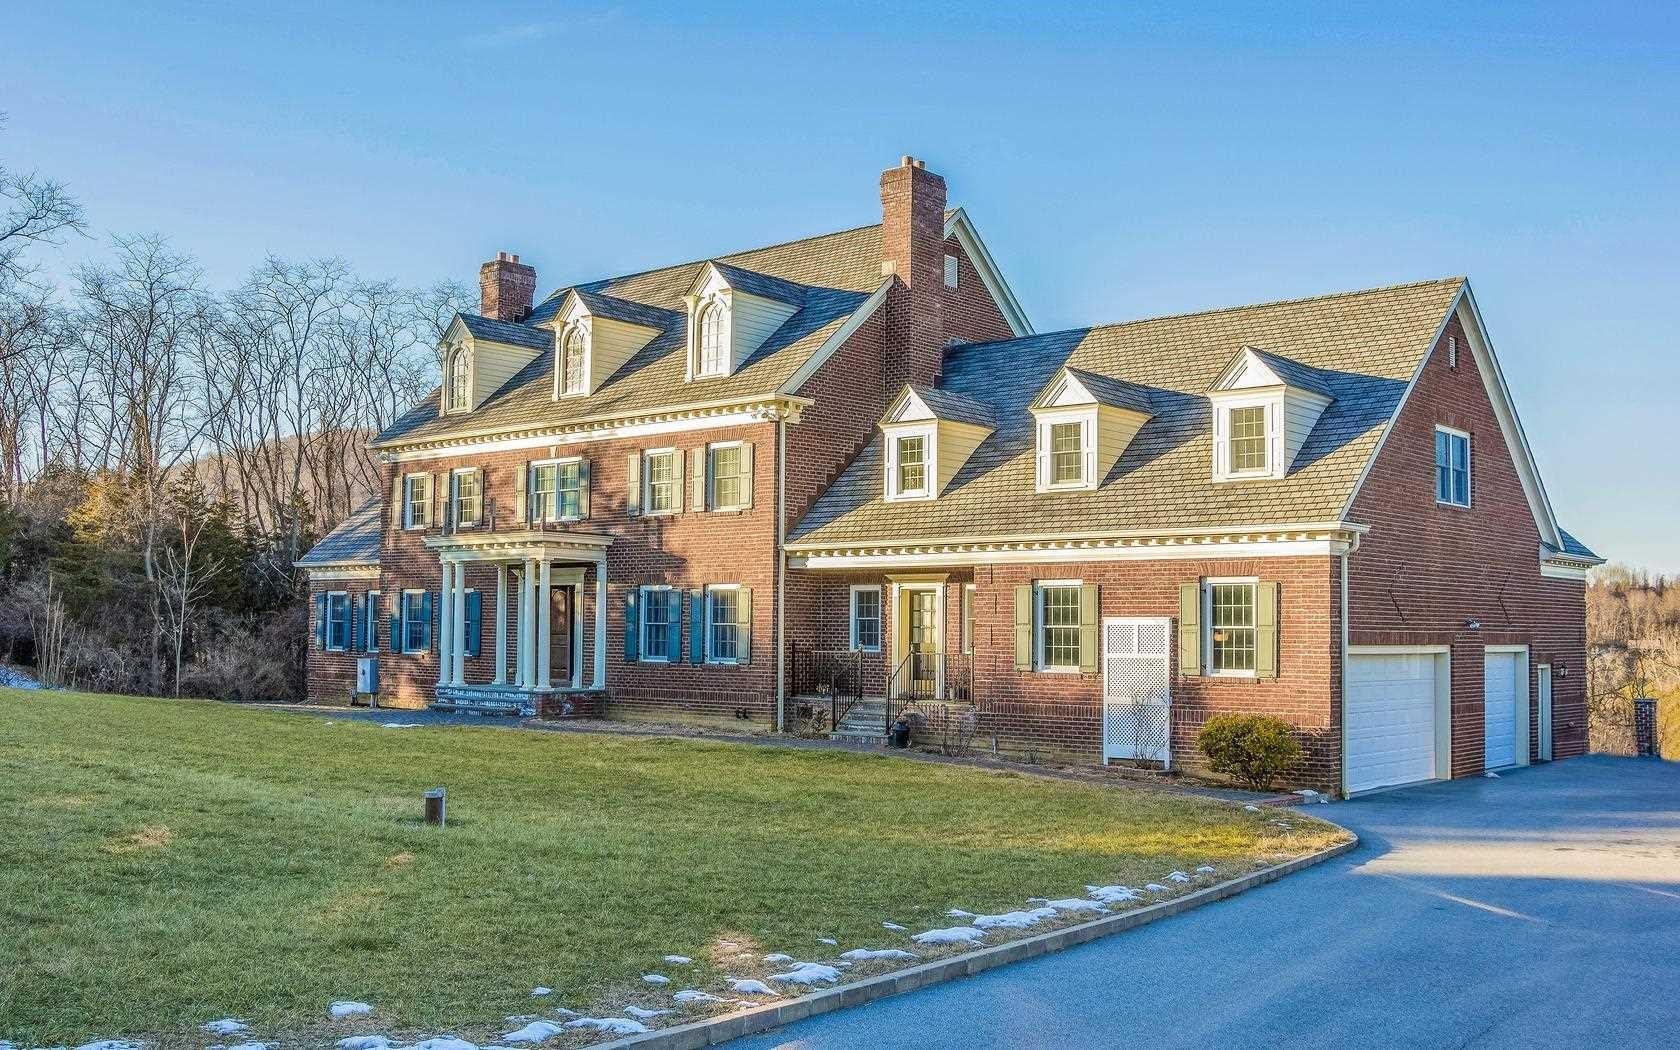 Single Family Home for Sale at 9 DI PIETRO LANE 9 DI PIETRO LANE Pawling, New York 12564 United States